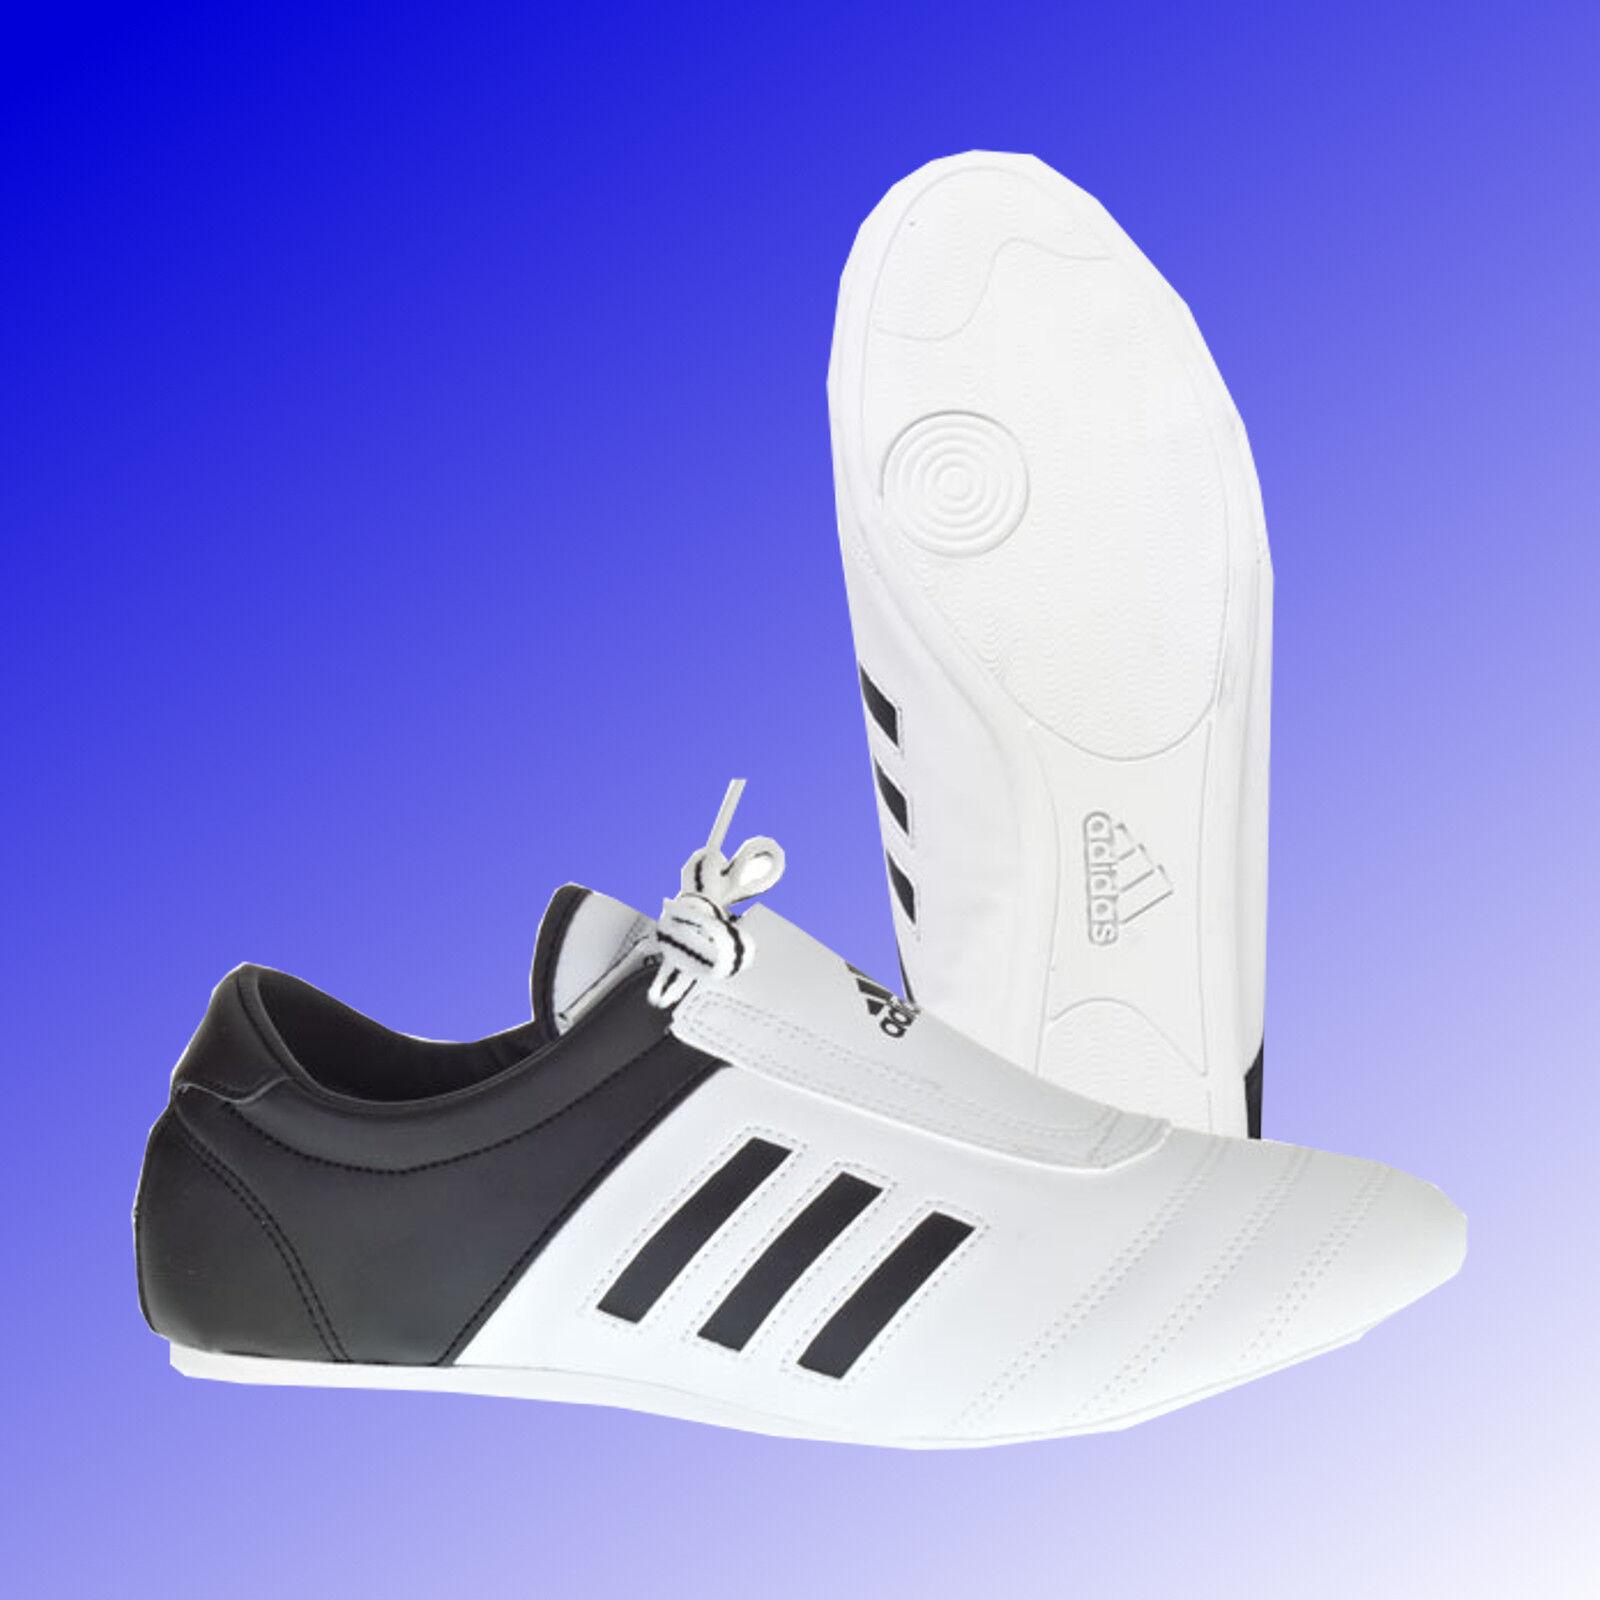 Adidas® Adi Kick I Taekwondo TKD Schuhe Sneaker Slipper weiß schwarz Gr. 36 - 46